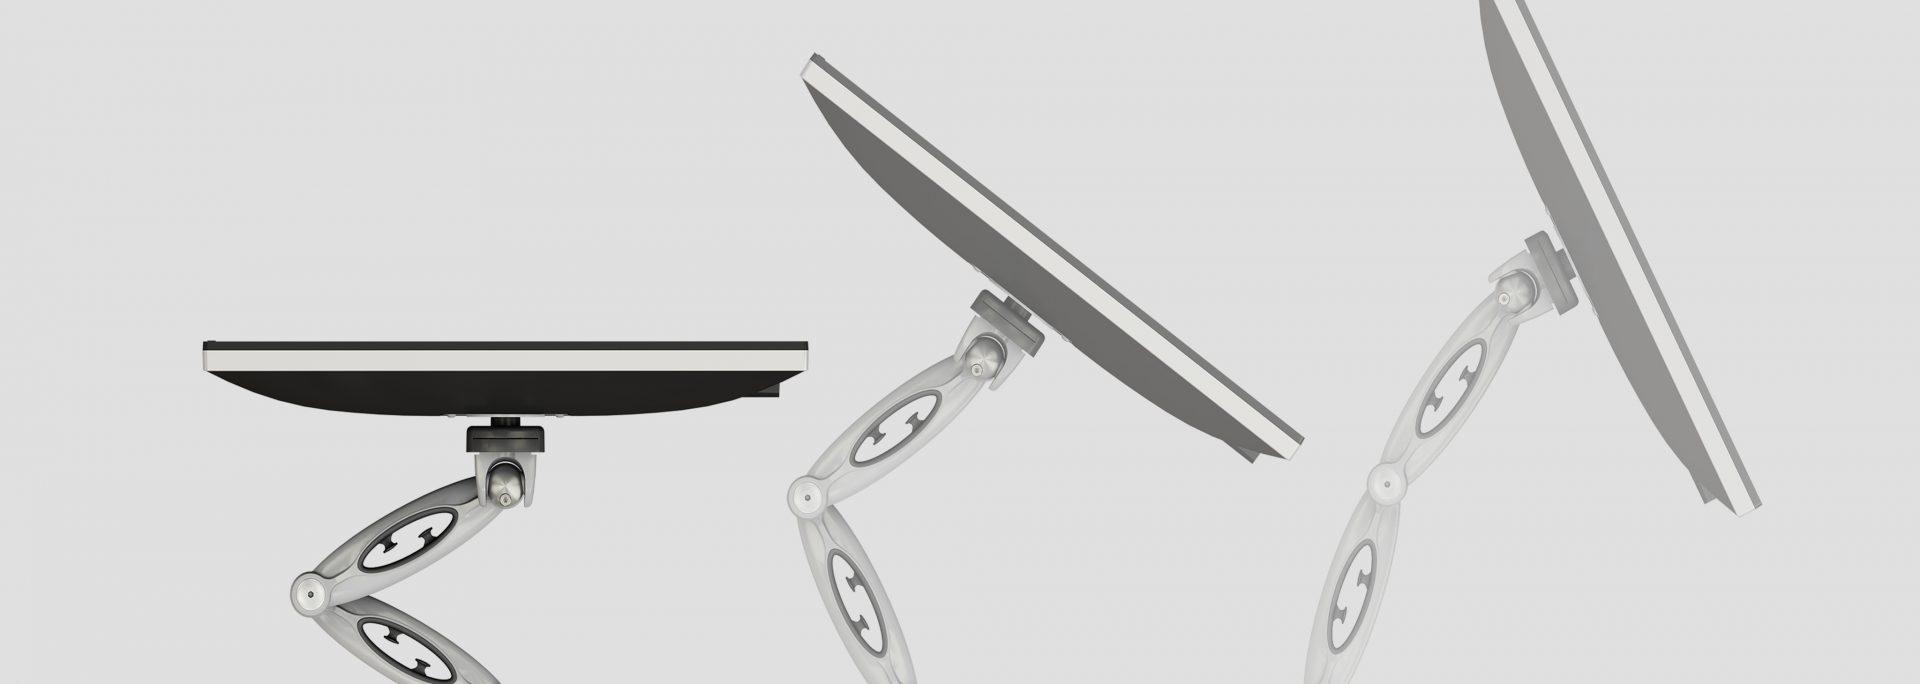 AXIOM monitor arm